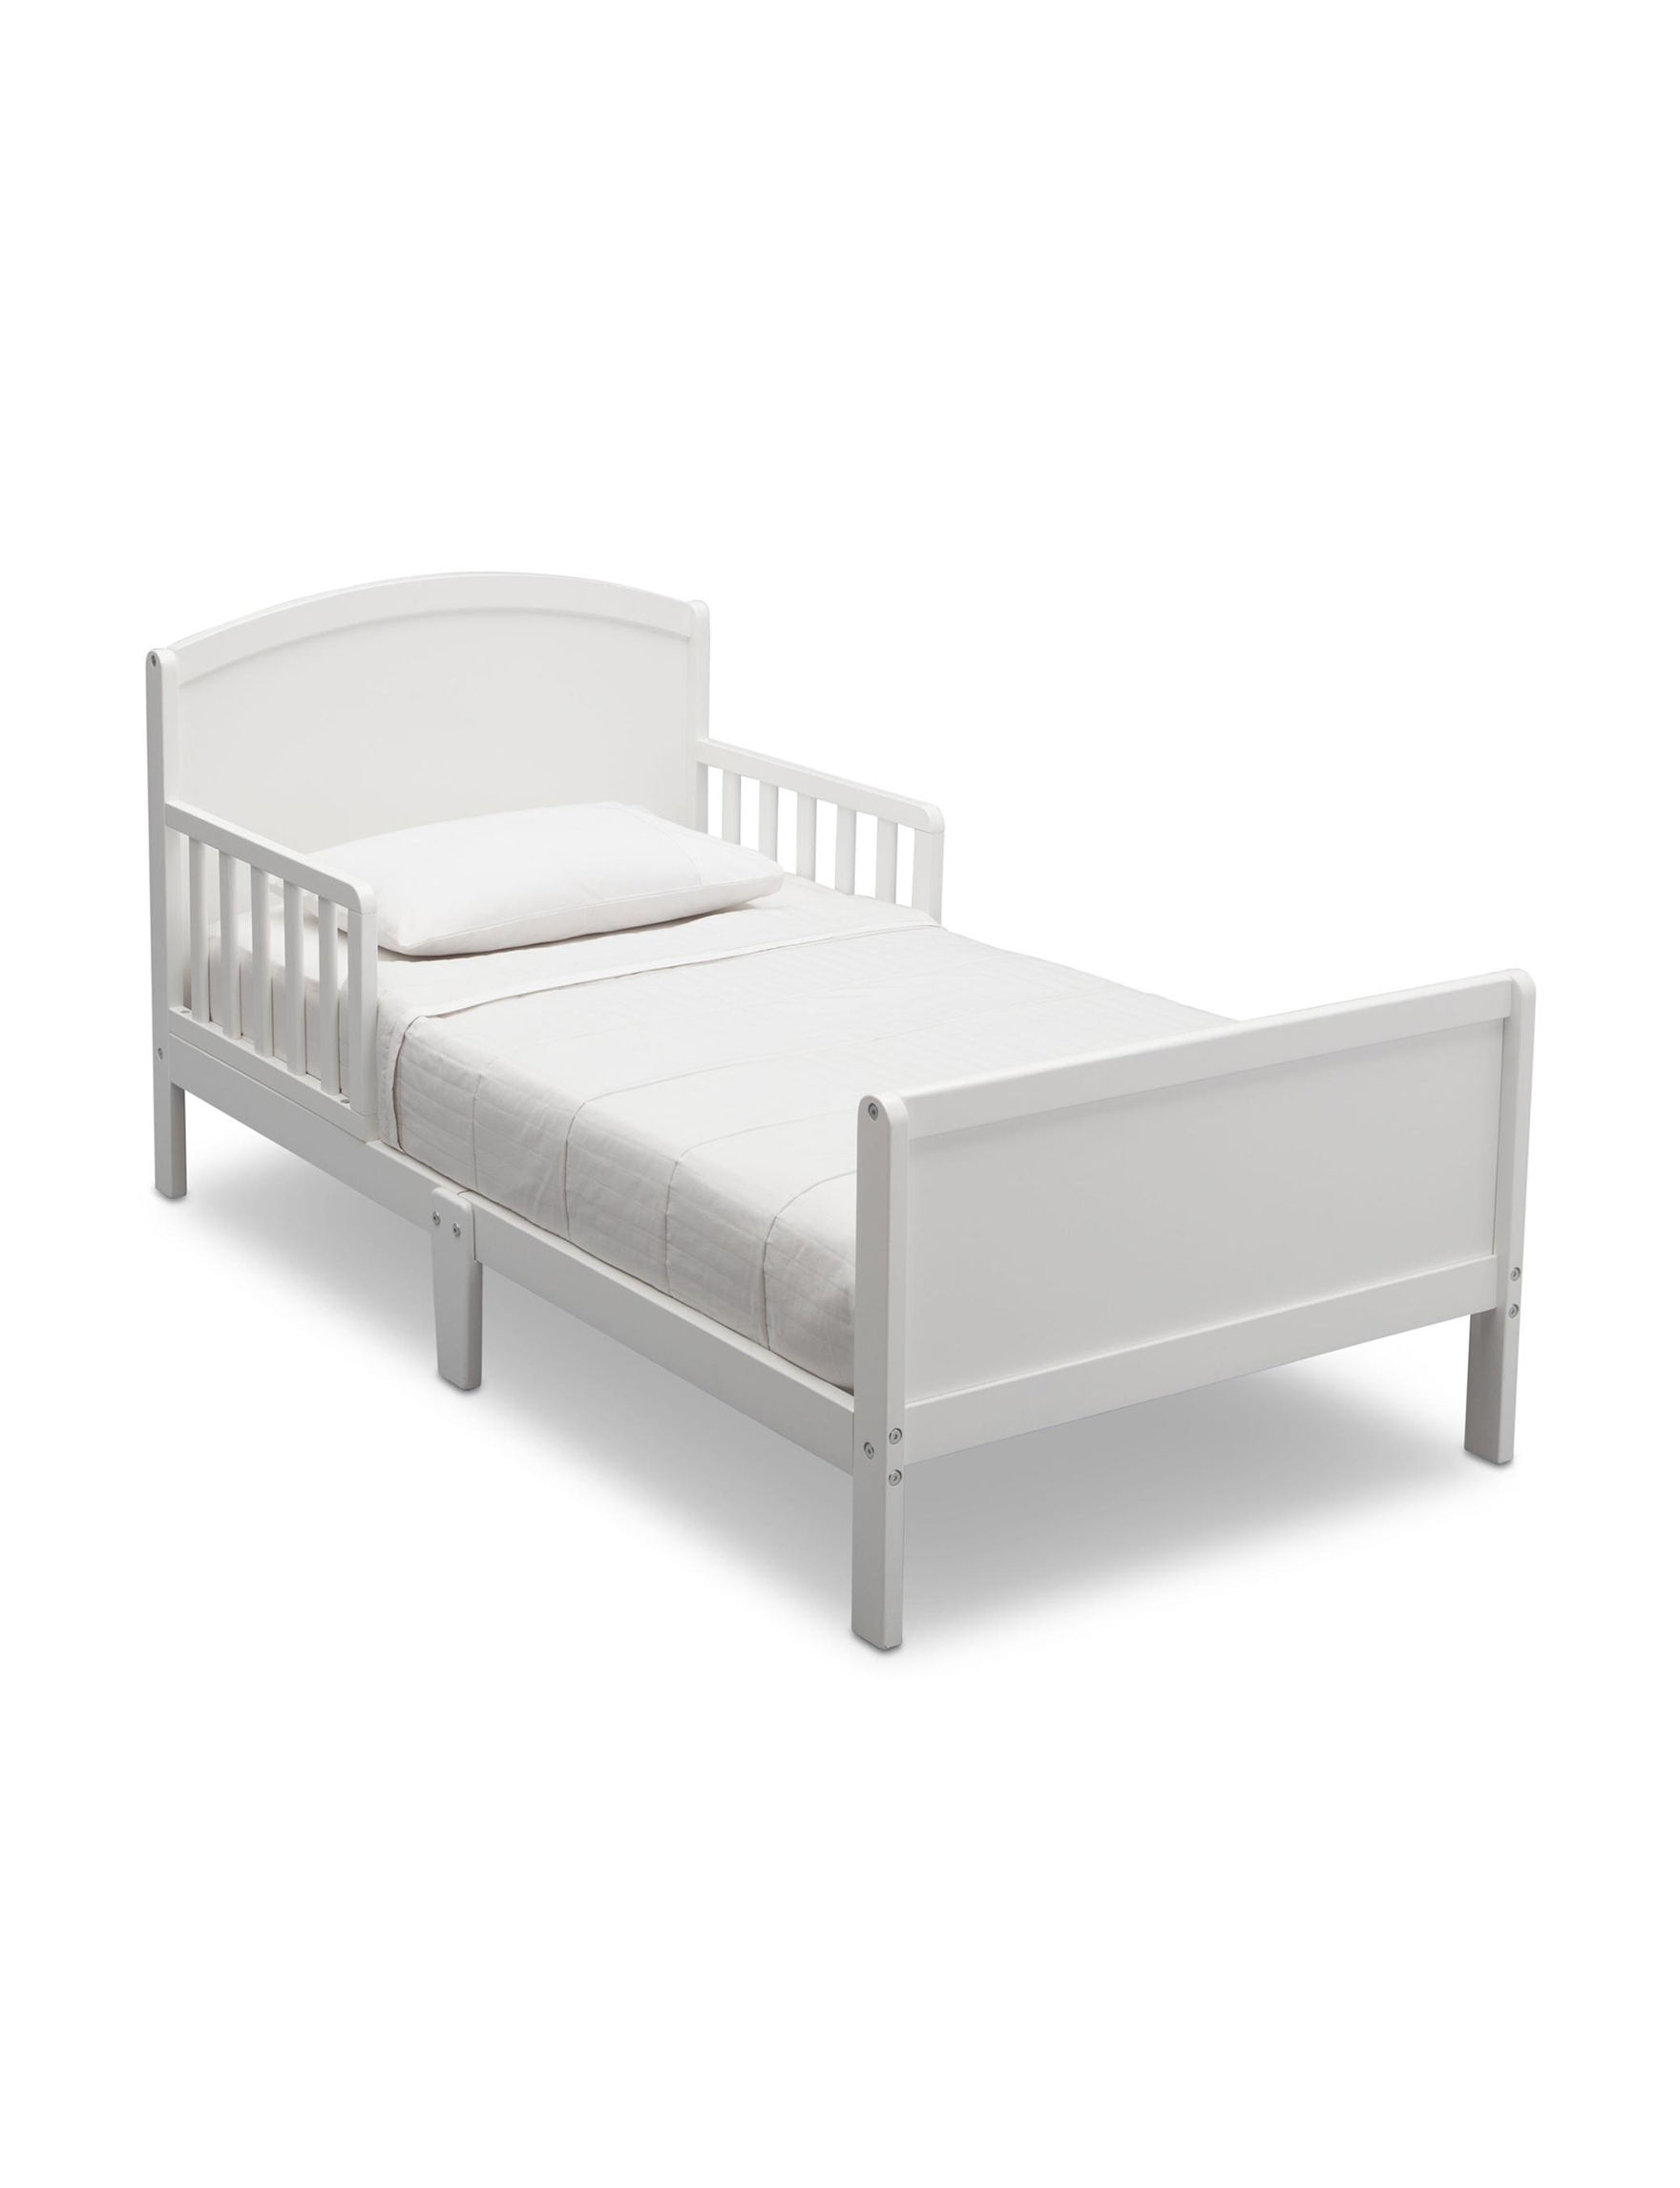 Delta White Bedroom Furniture